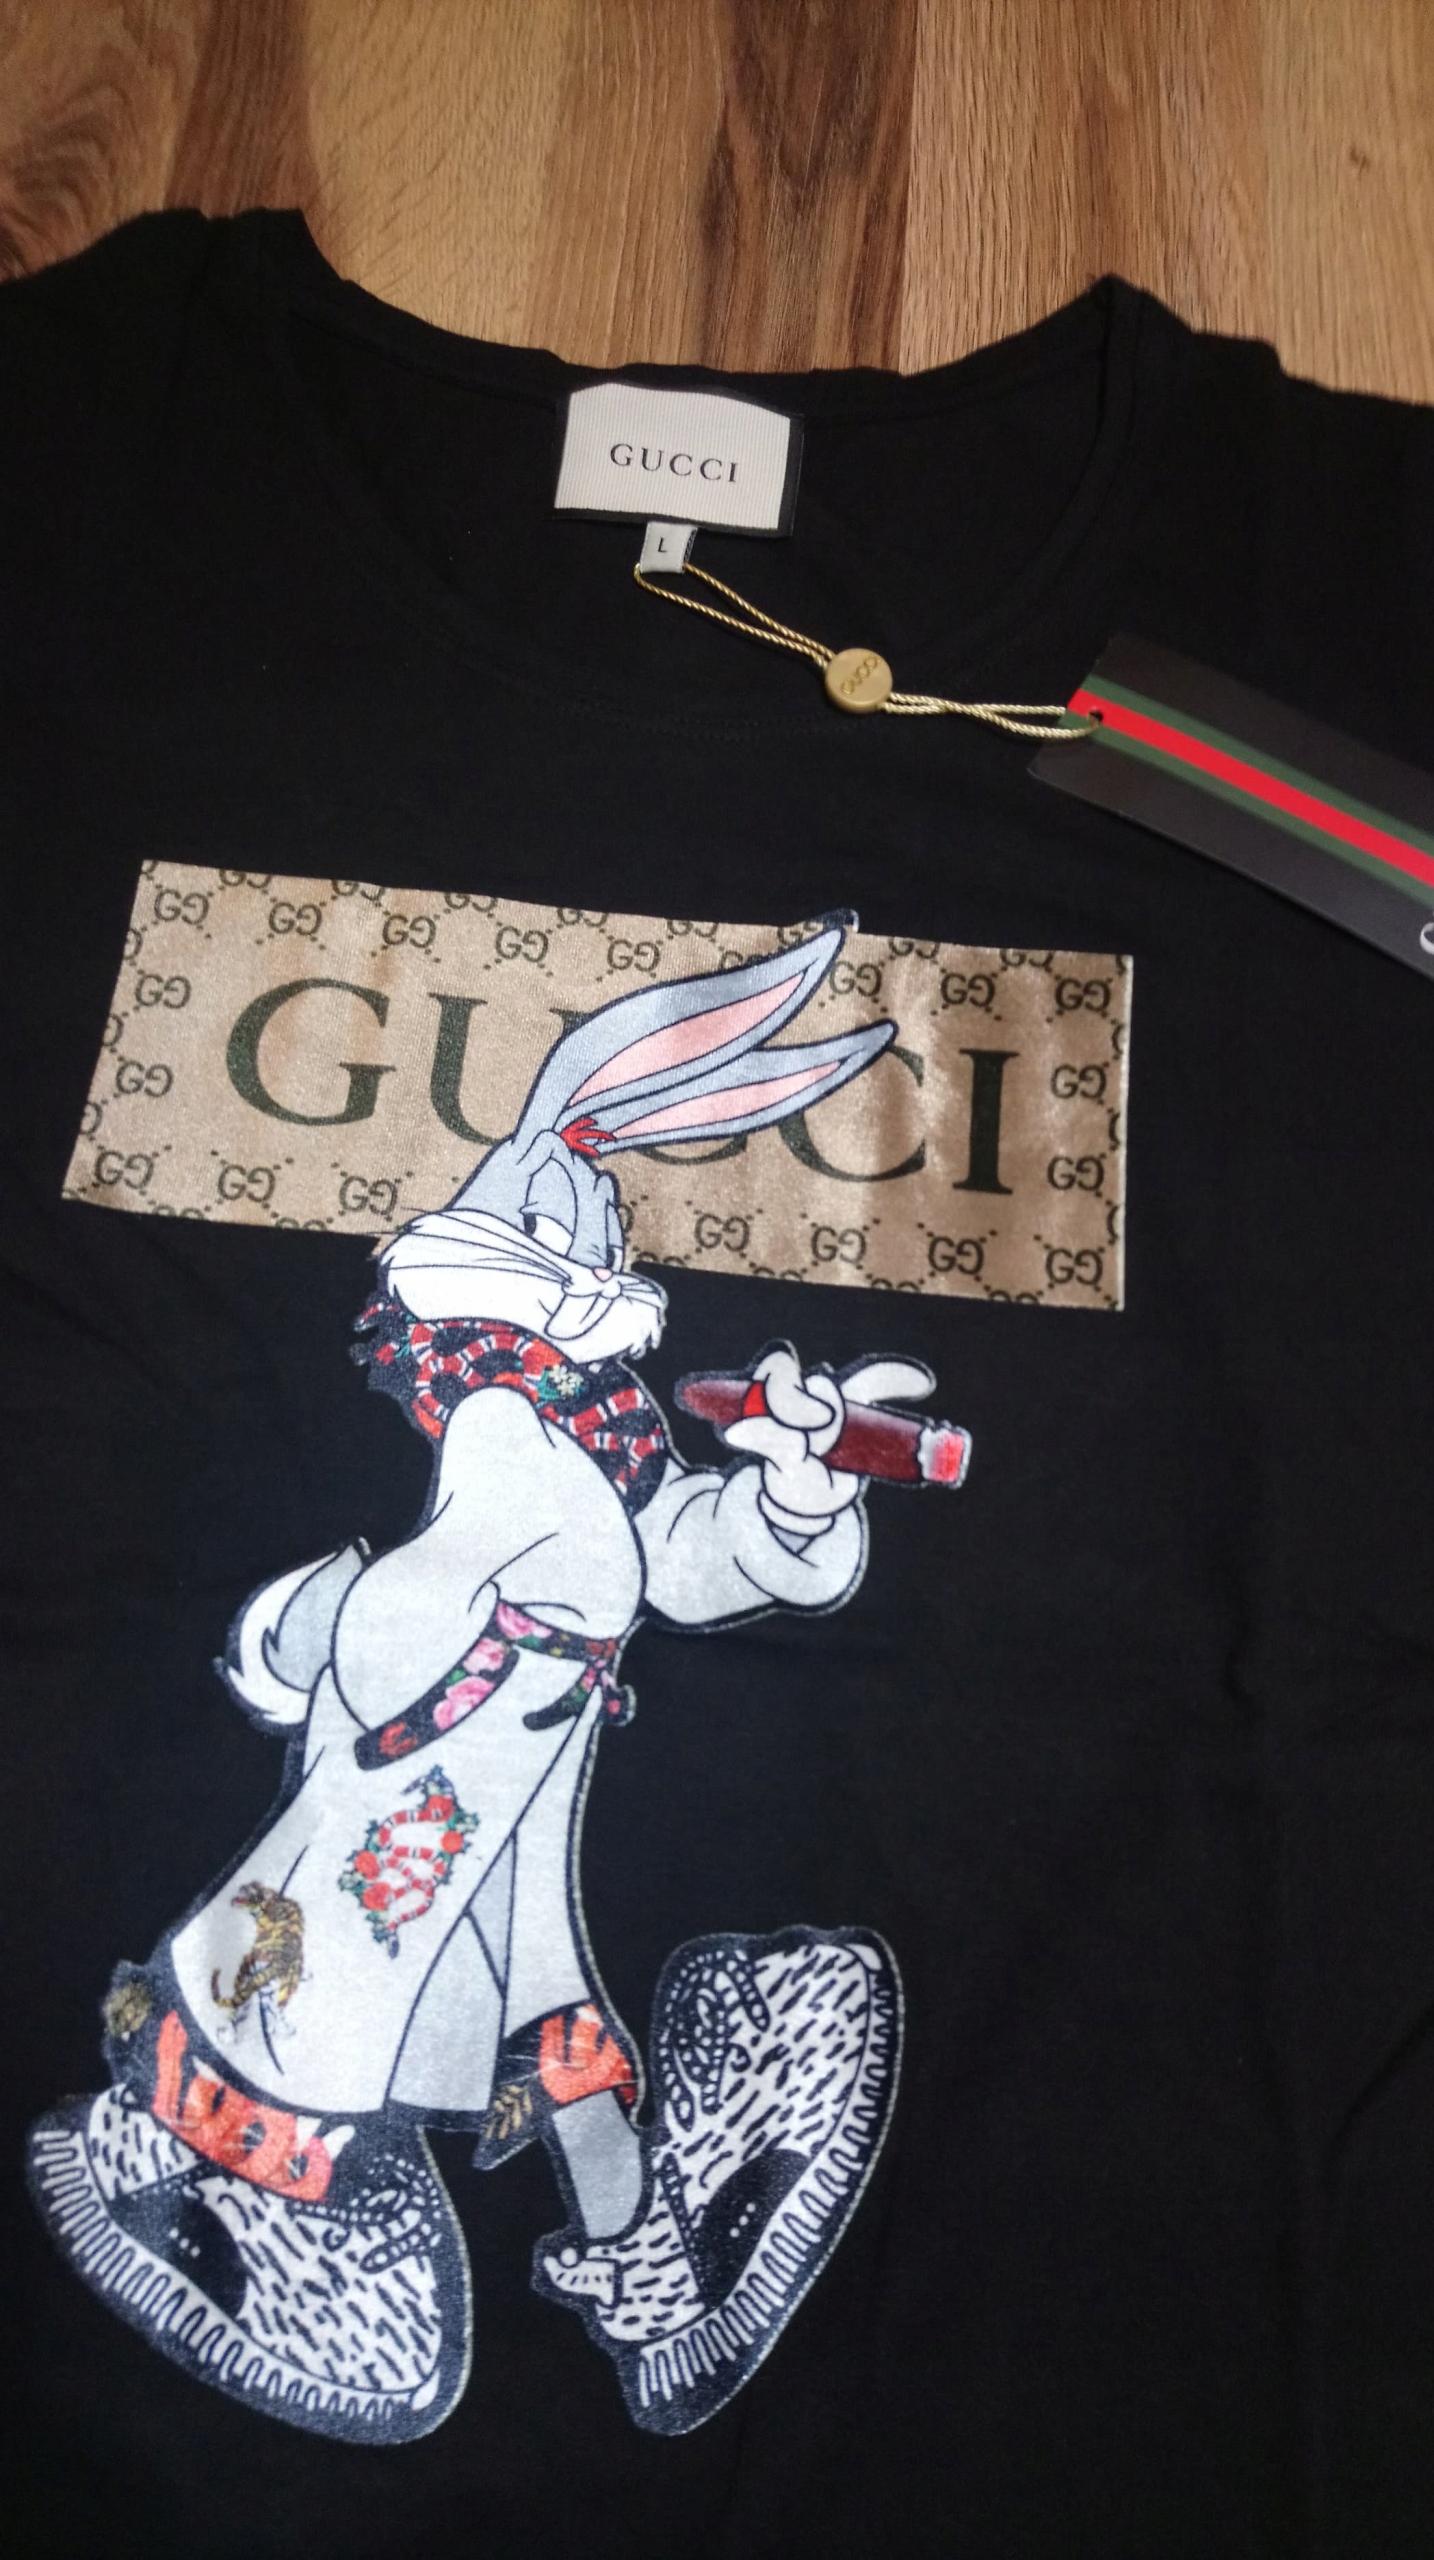 113462d253b41 T-Shirt GUCCI koszulka damska S KRÓLIK bugs - 7814978870 - oficjalne ...